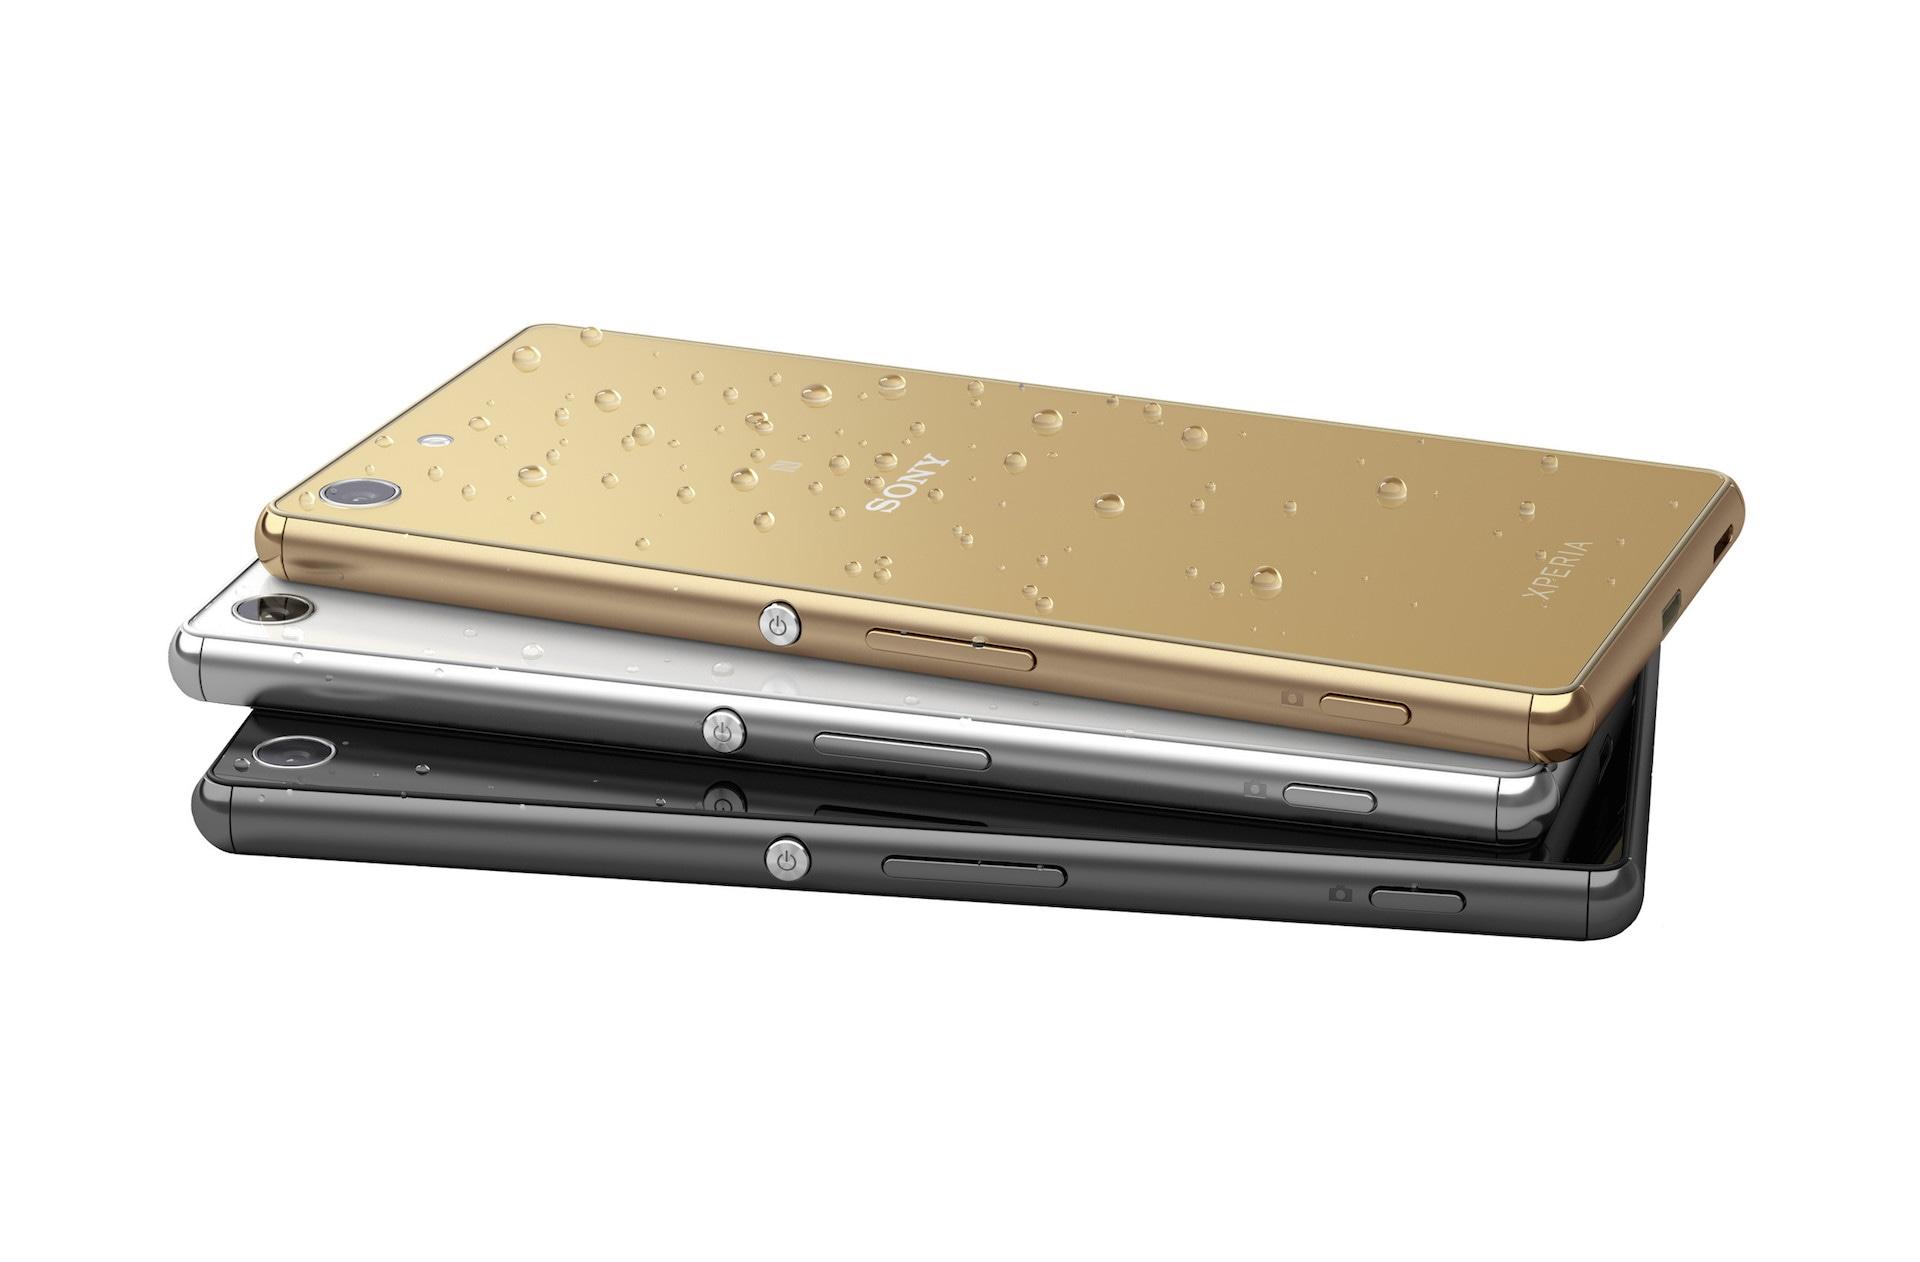 Sony Xperia M5 render ufficiale – 1